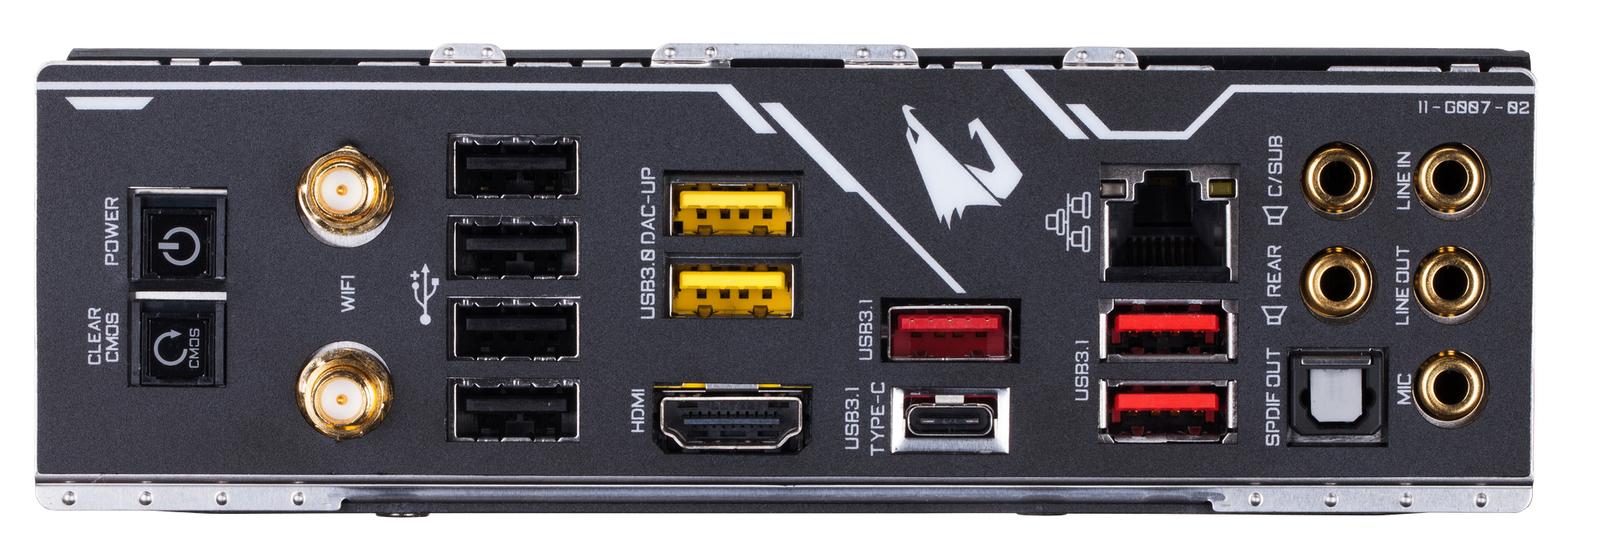 Gigabyte Z390 Aorus Master Motherboard image